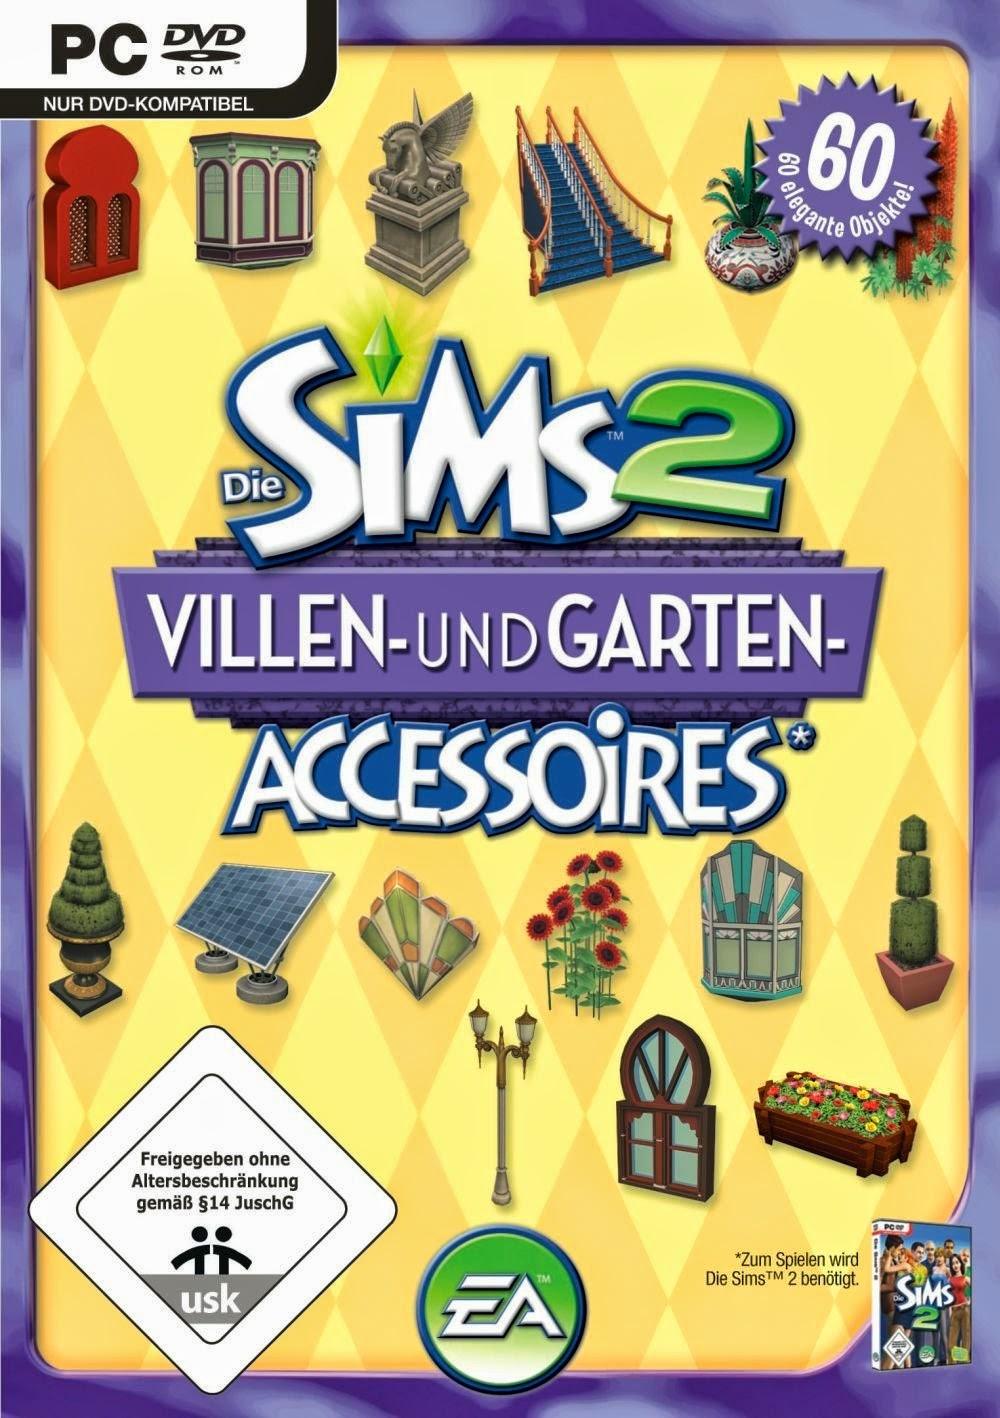 http://www.amazon.de/Die-Sims-Villen-Garten-Accessoires-Add/dp/B001FZ1378/ref=sr_1_11?ie=UTF8&s=videogames&qid=1273068545&sr=8-11